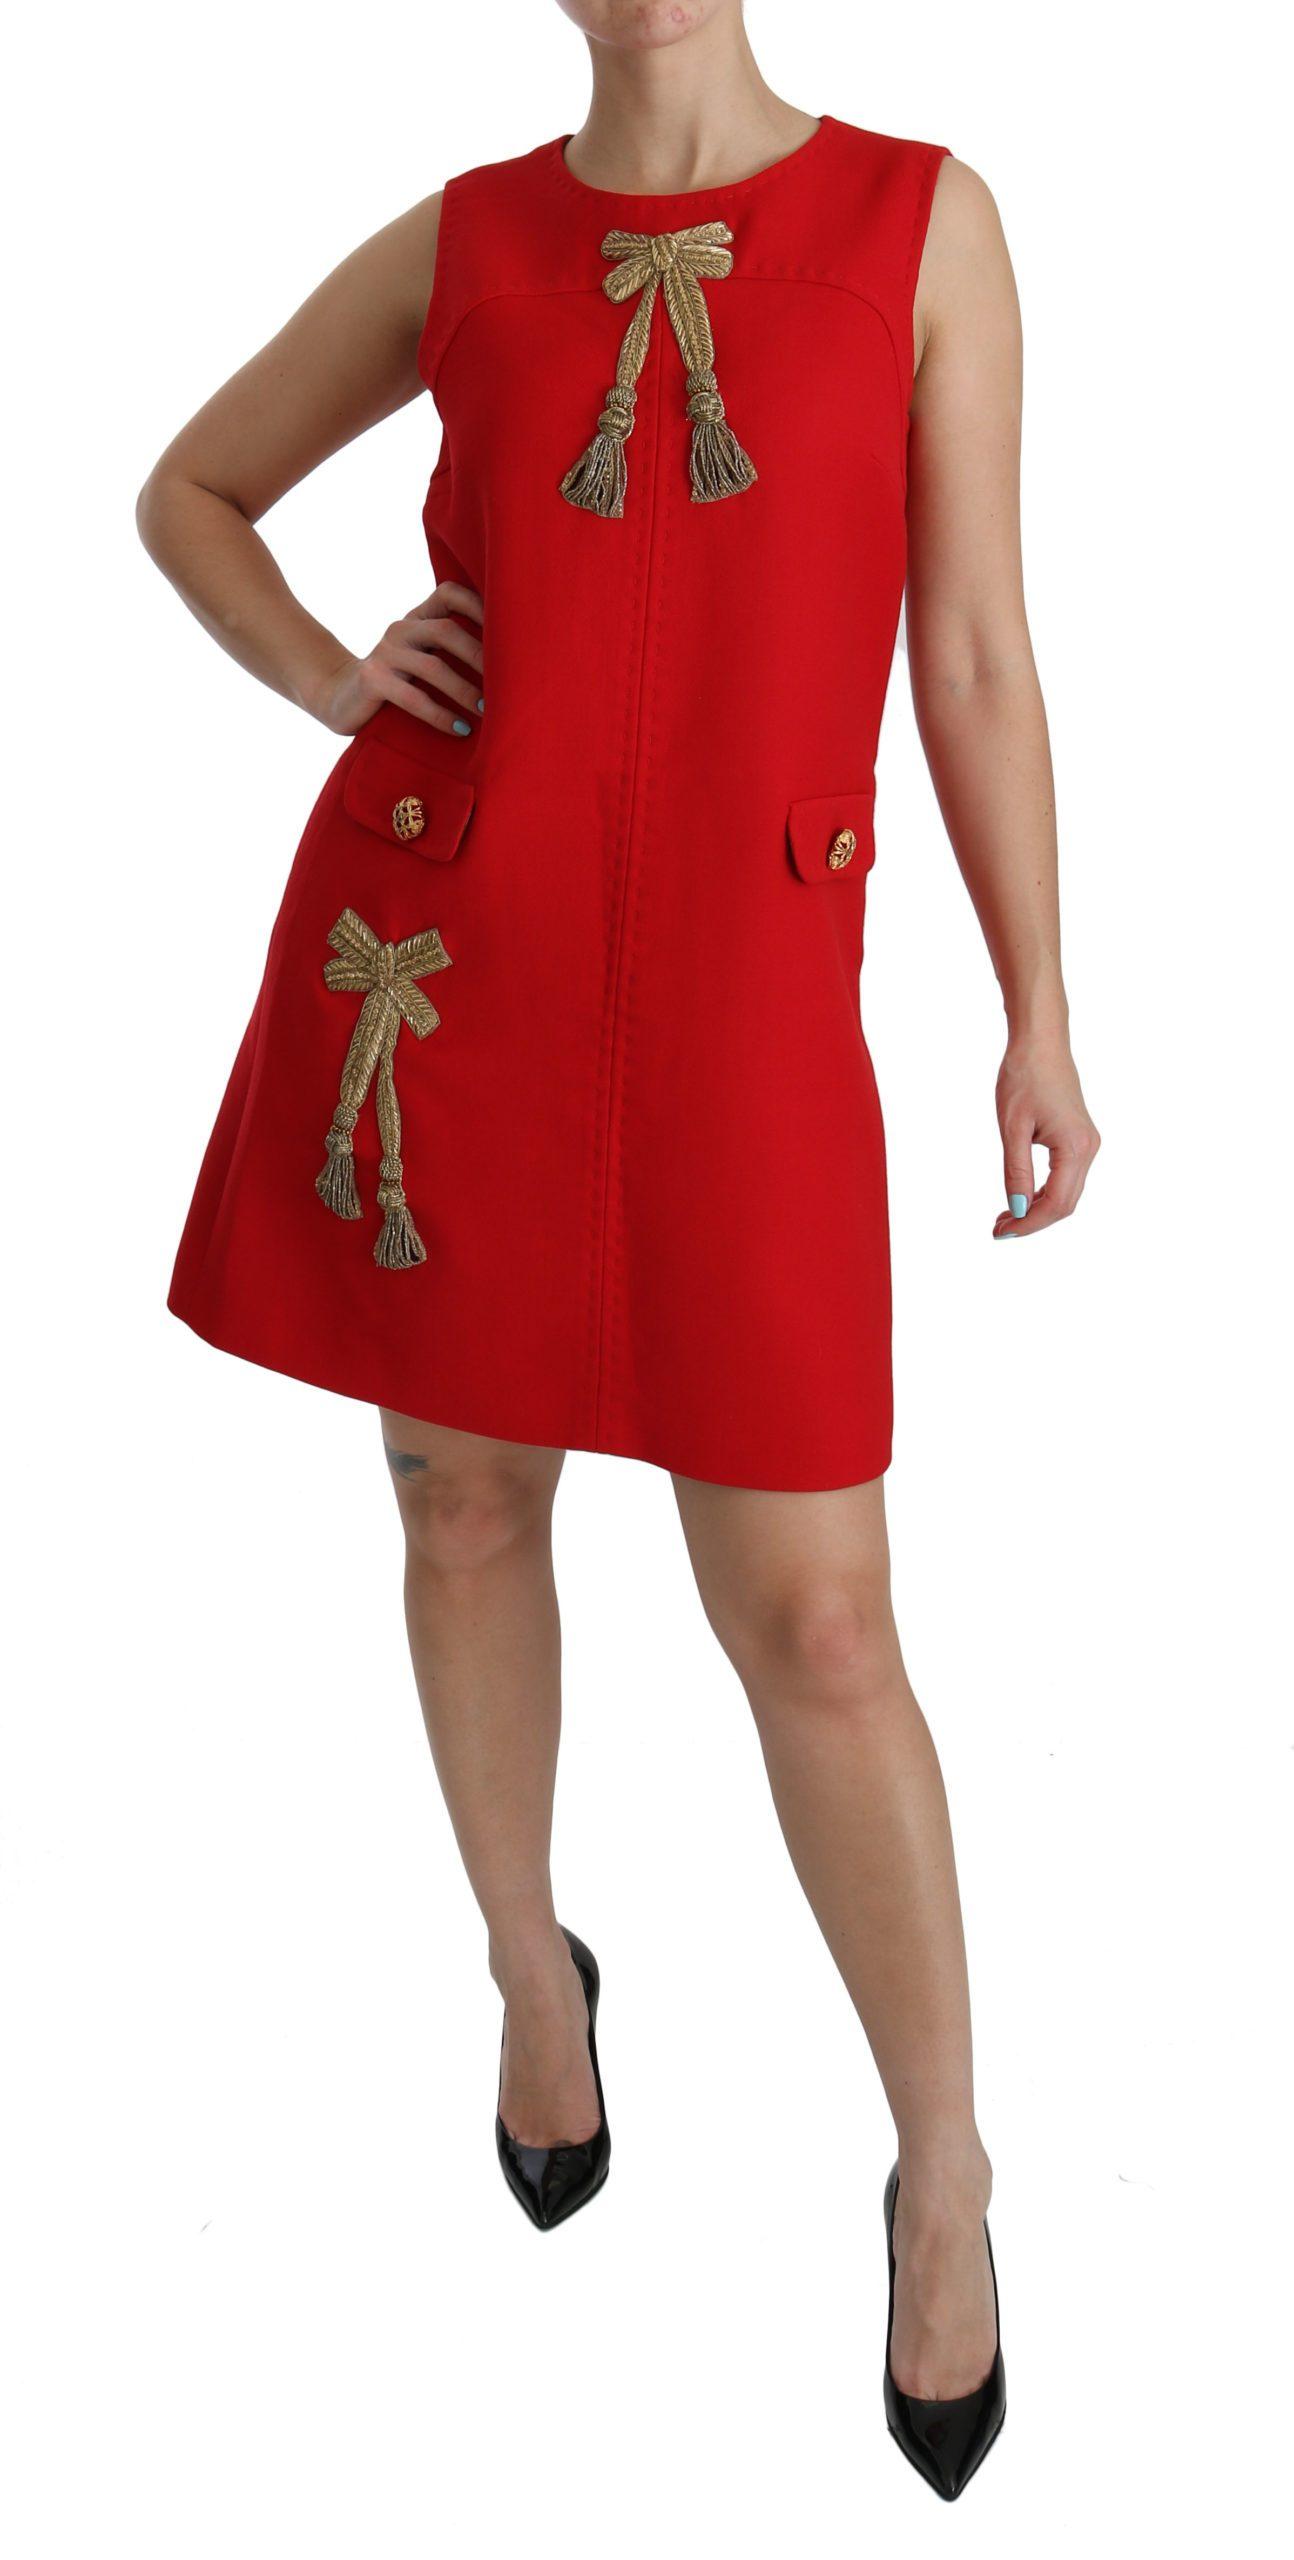 Dolce & Gabbana Women's Sheath Tassel Sleeveless Mini Dress Red DR2076 - IT46 XL